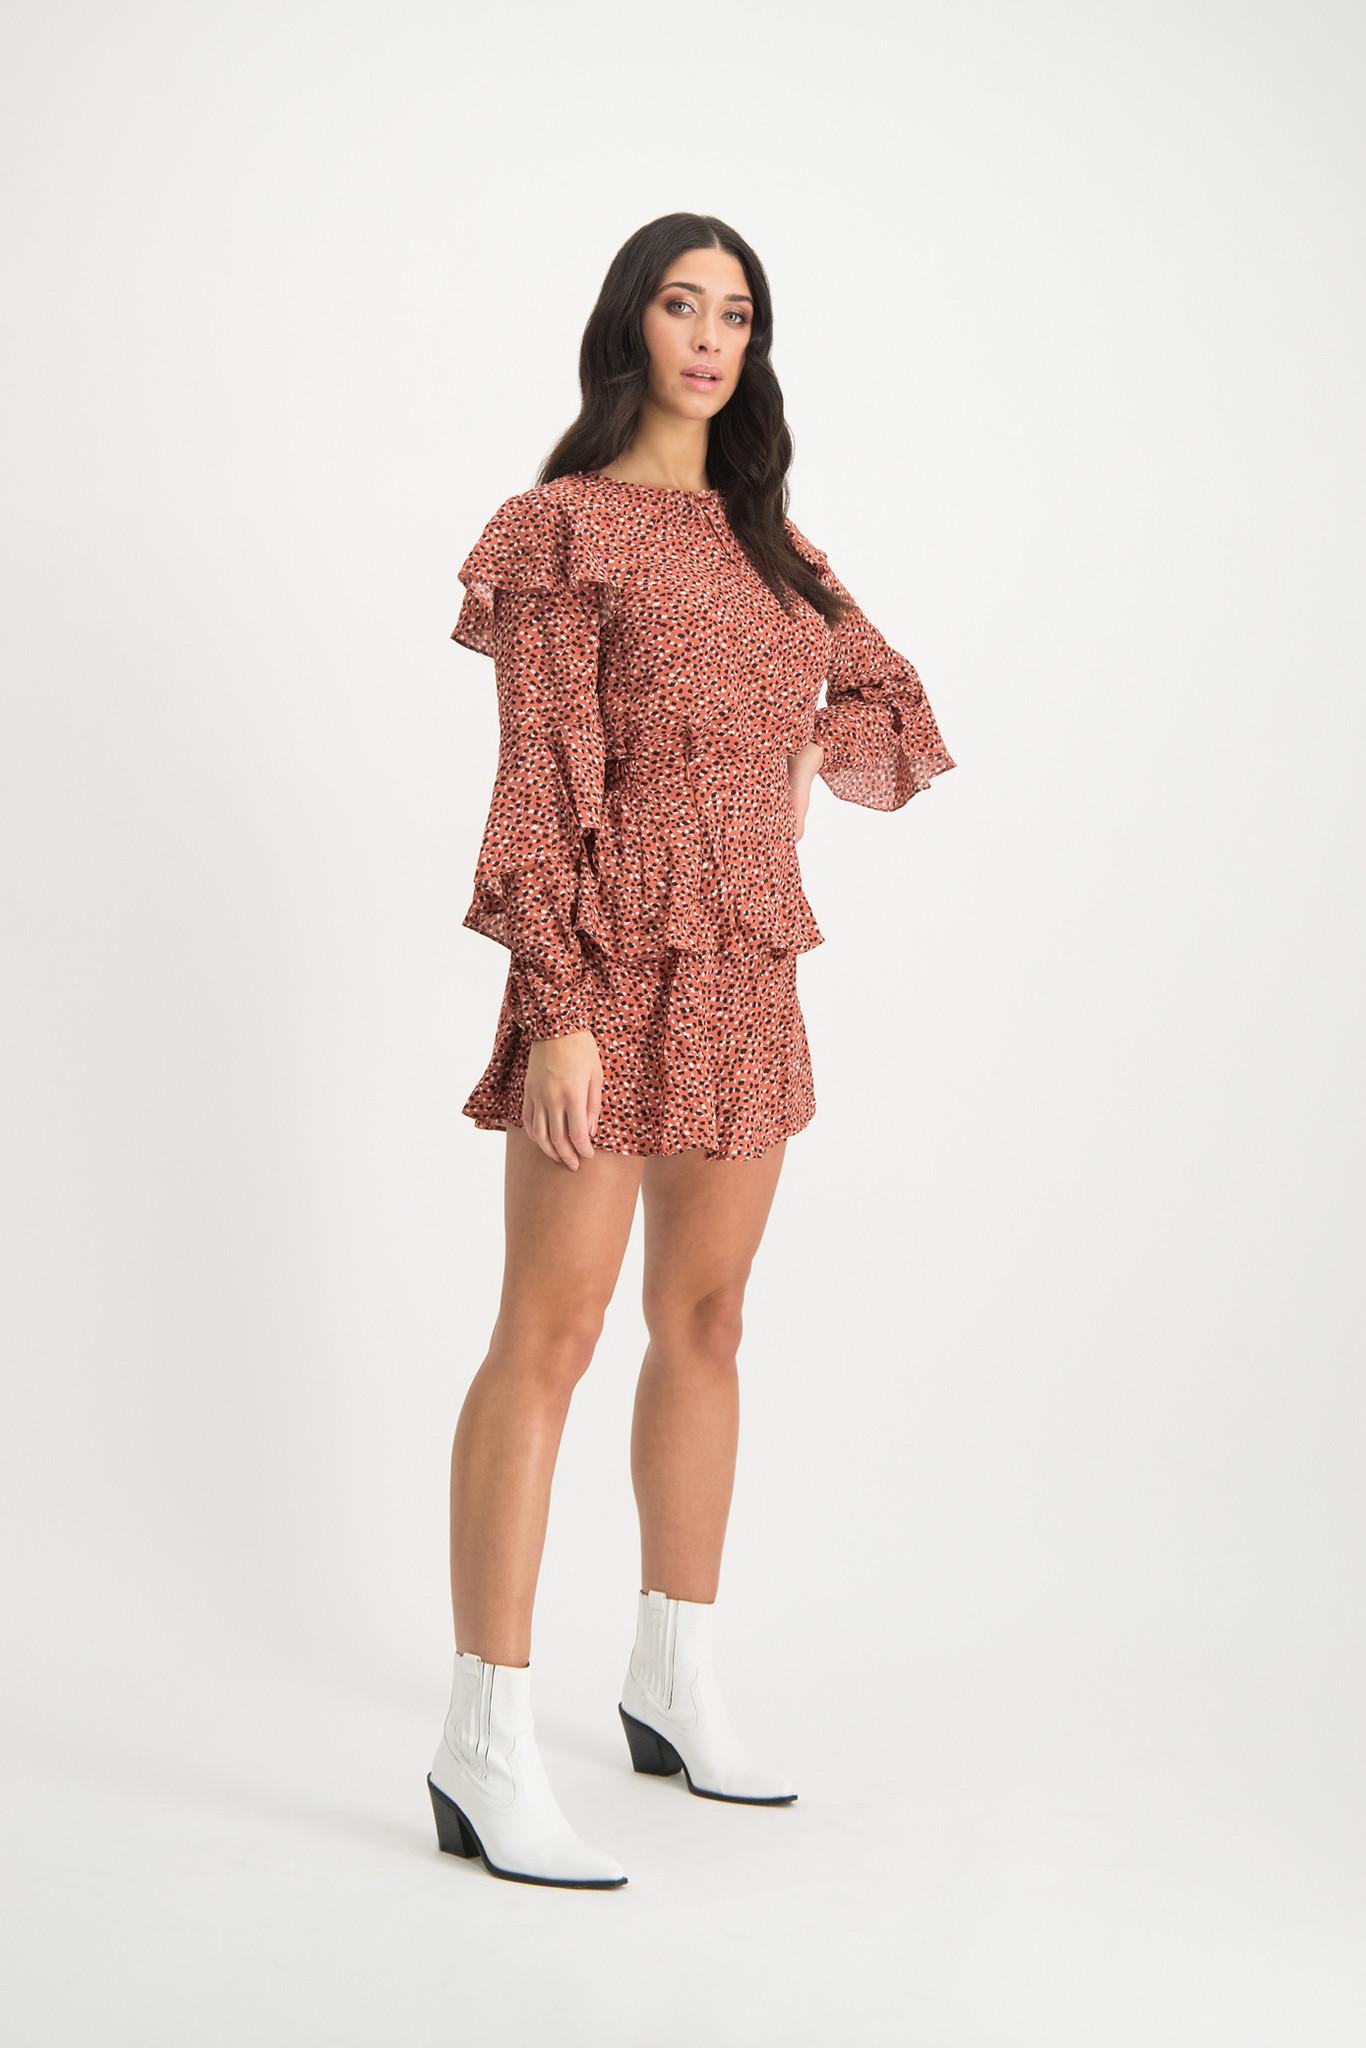 Lofty Manner Black-Pink Animalprint Skirt Neva